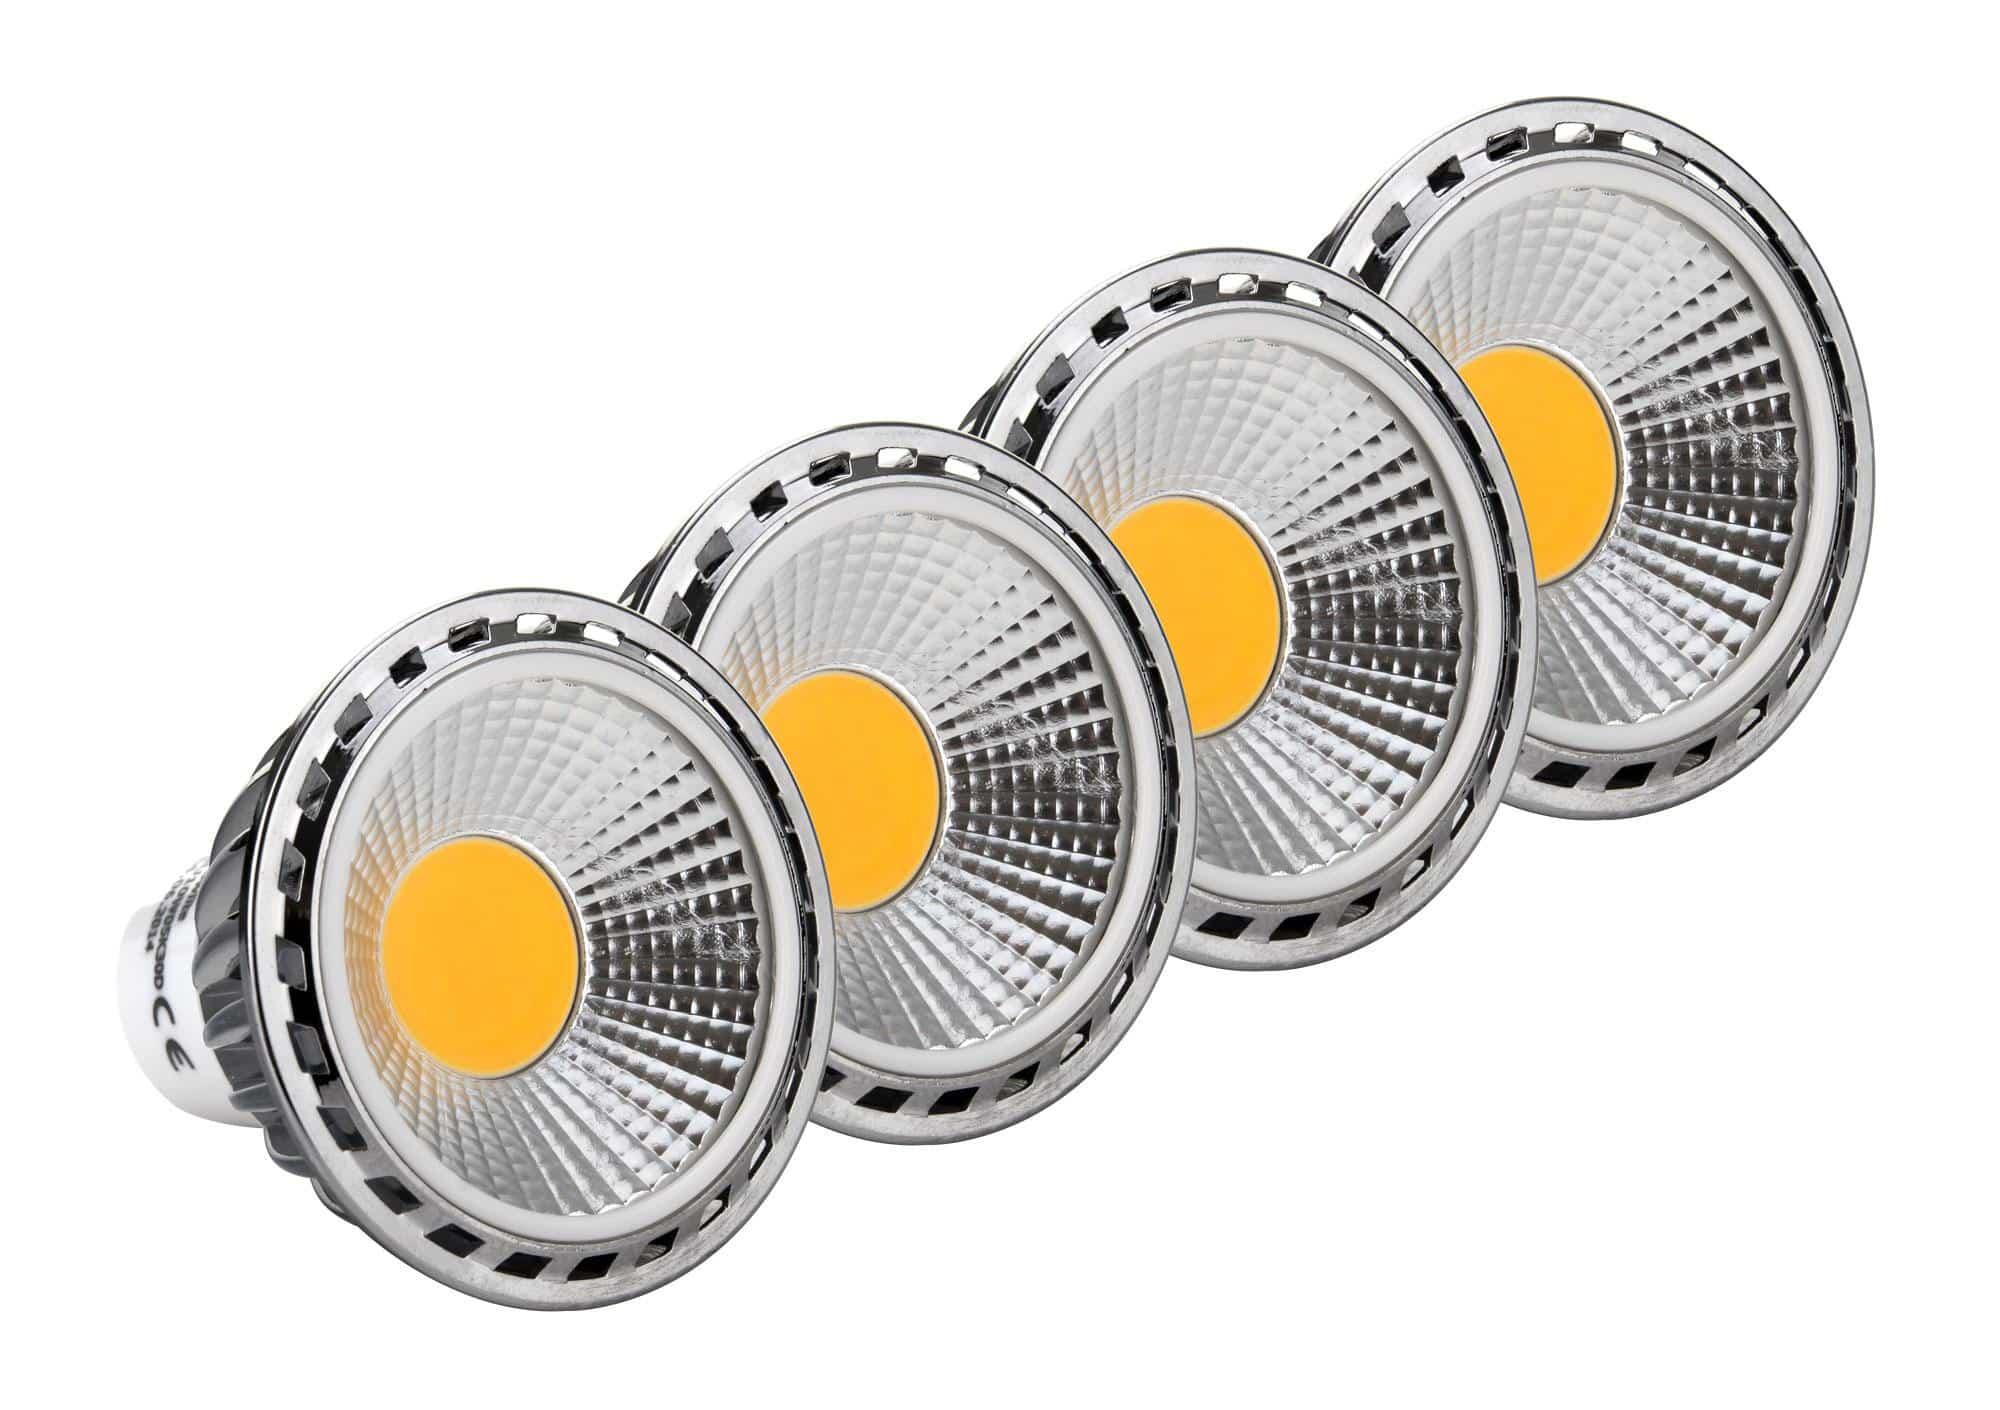 4x set showlite led spotlight gu10w05k30n 5 watt 330 lumen socket gu10 3000 kelvin. Black Bedroom Furniture Sets. Home Design Ideas